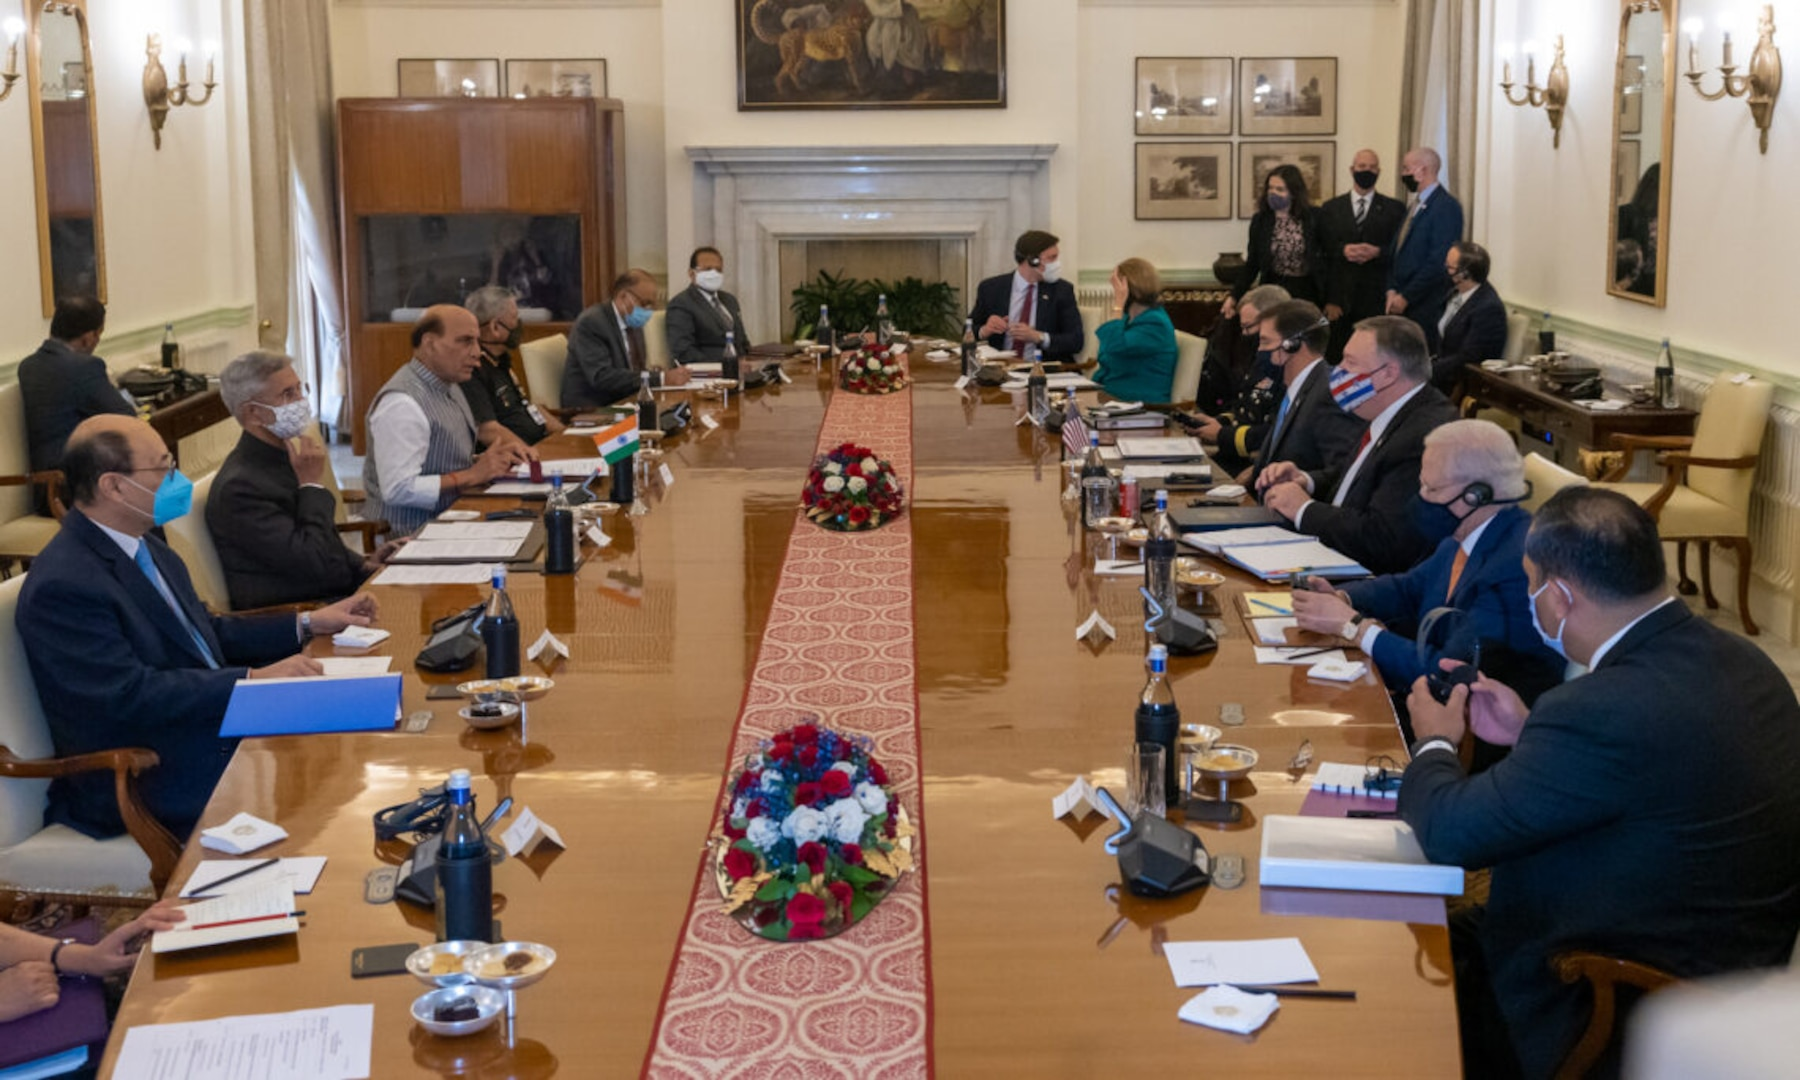 Sec Pompeo, Sec Esper, Min Singh, & Min Jaishankar Opening Statements at U.S.-India 2+2 Ministerial Dialogue